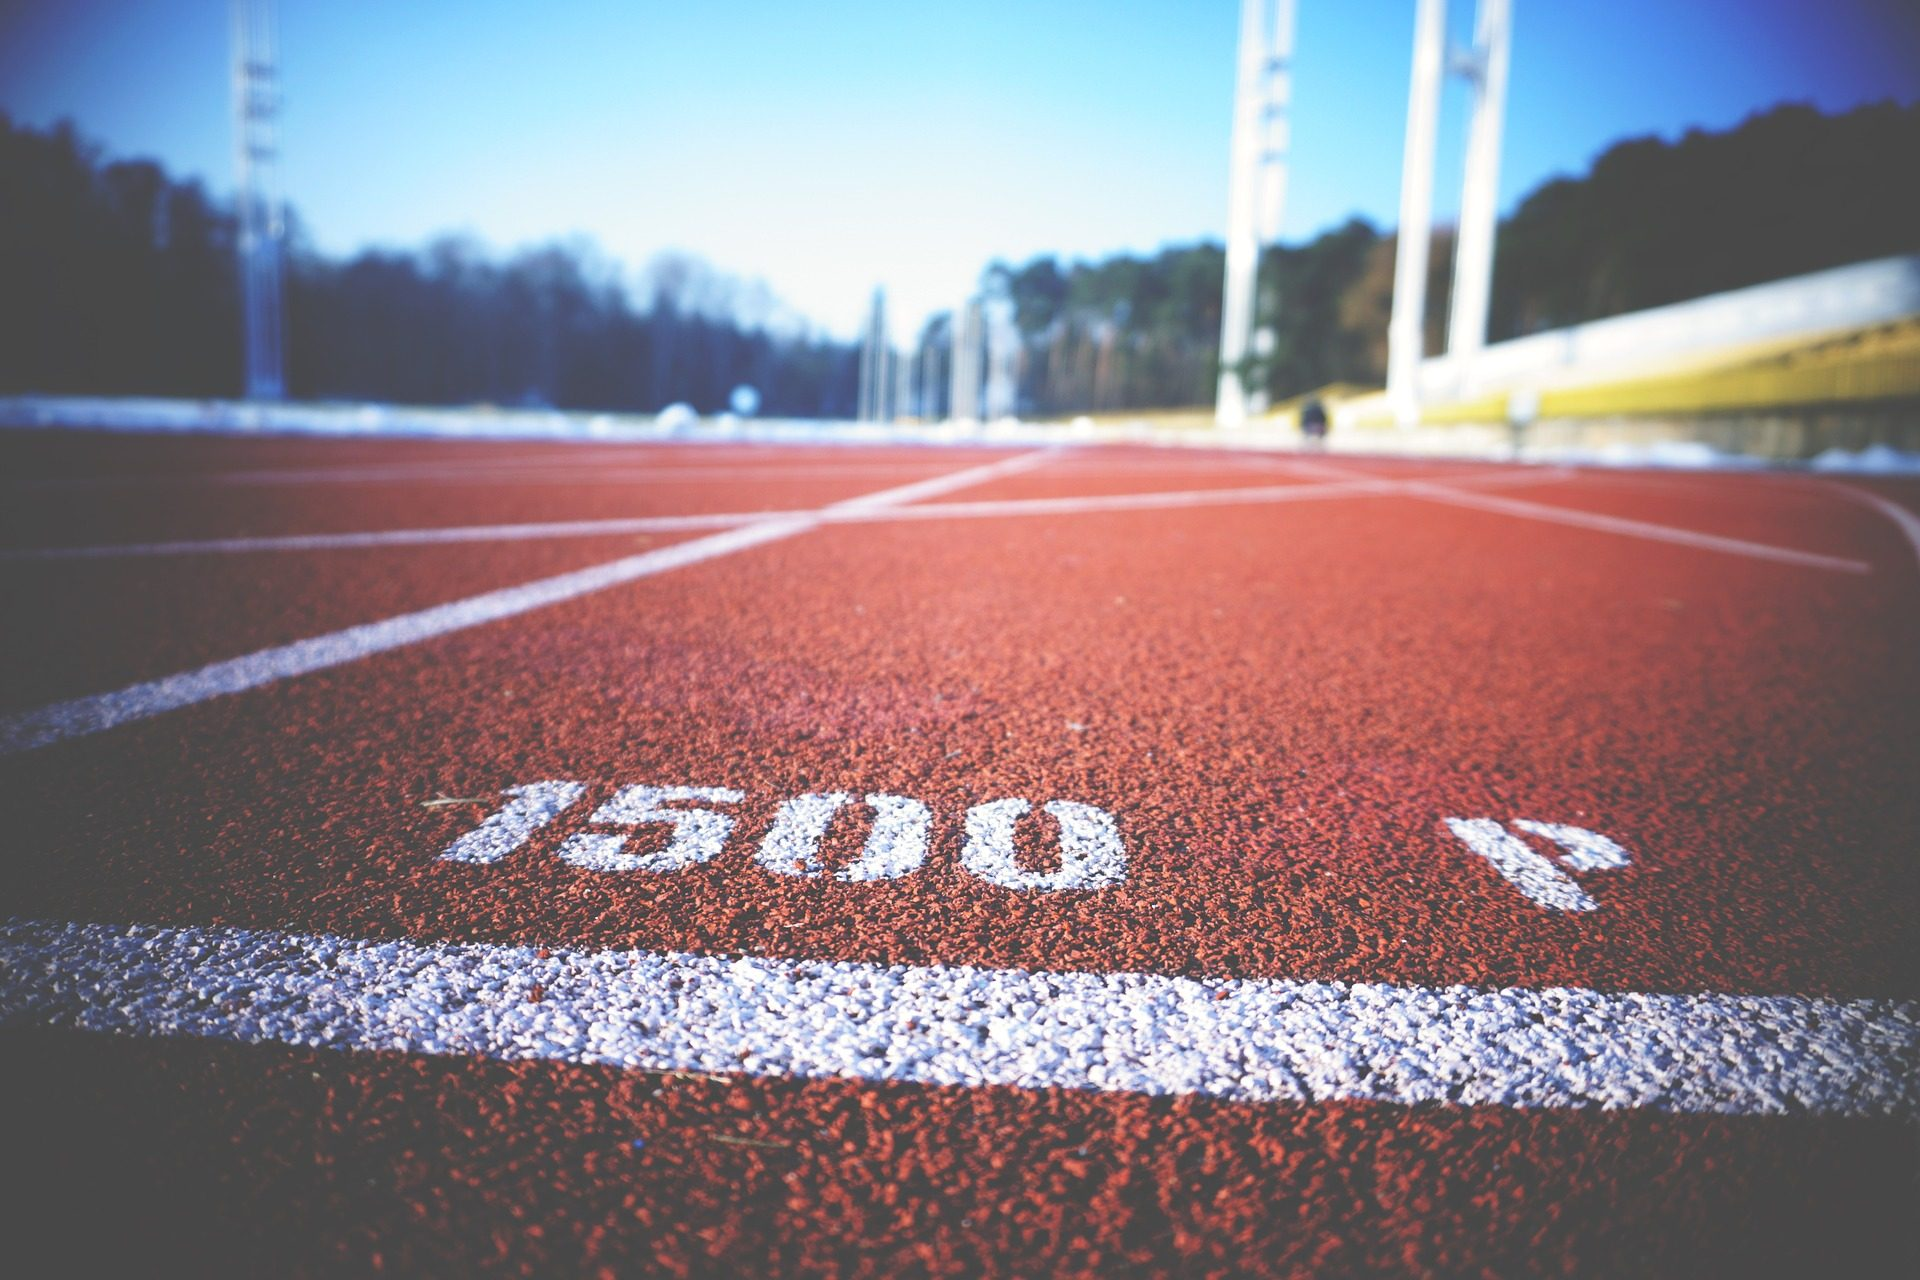 Track, Leichtathletik, Marke, Signal, Wettbewerb - Wallpaper HD - Prof.-falken.com